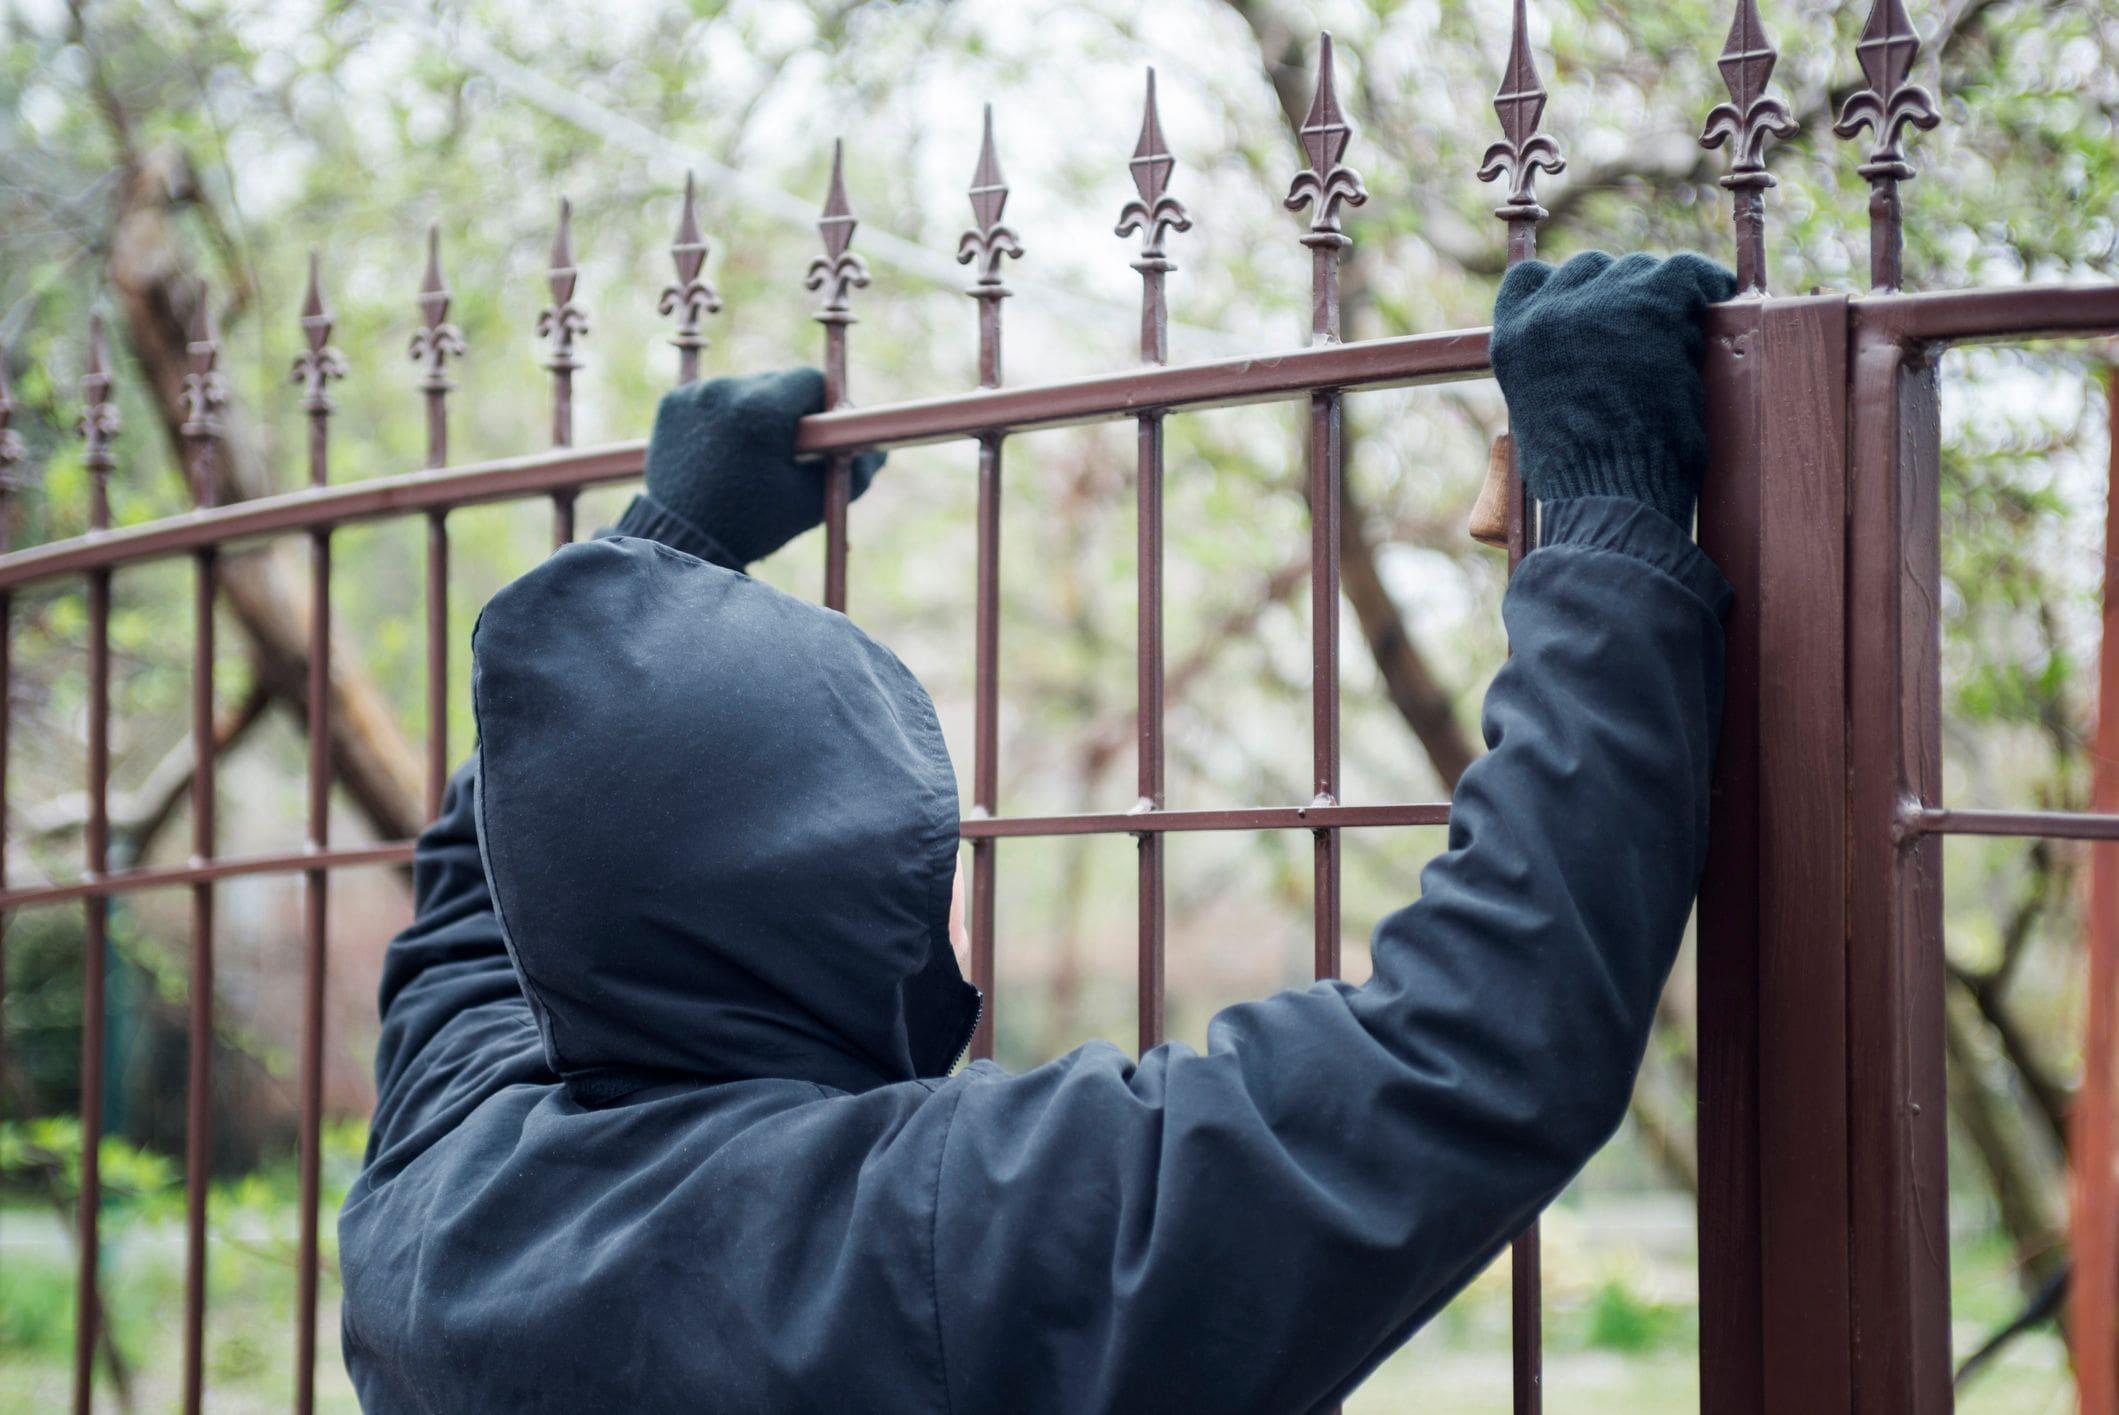 intruder wearing dark gloves and hoodie peers over ornamental wrought iron gate